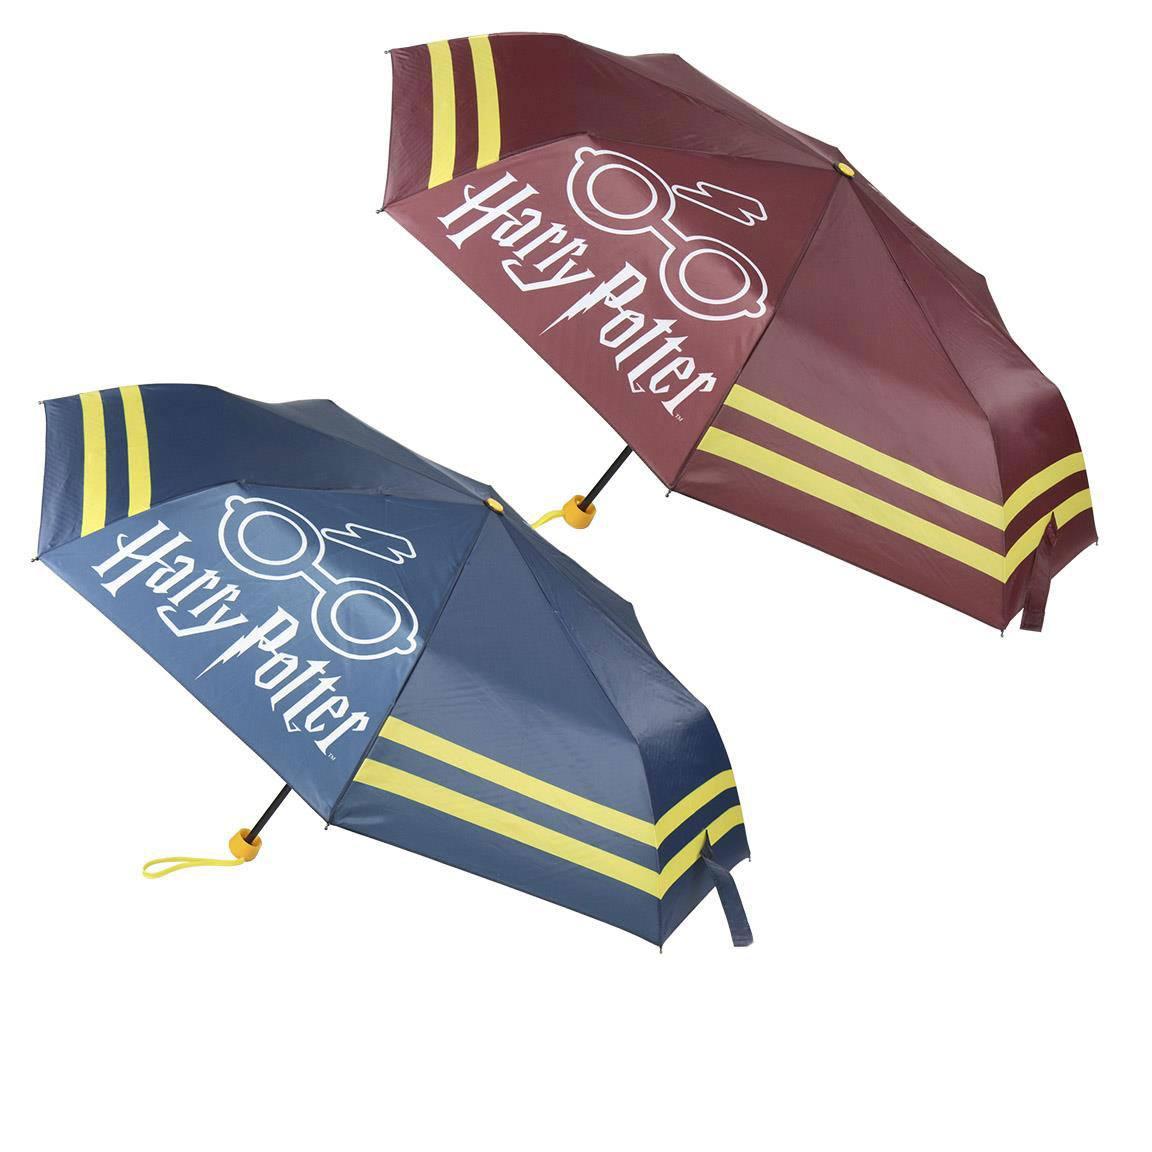 Harry Potter Umbrella Case (12)